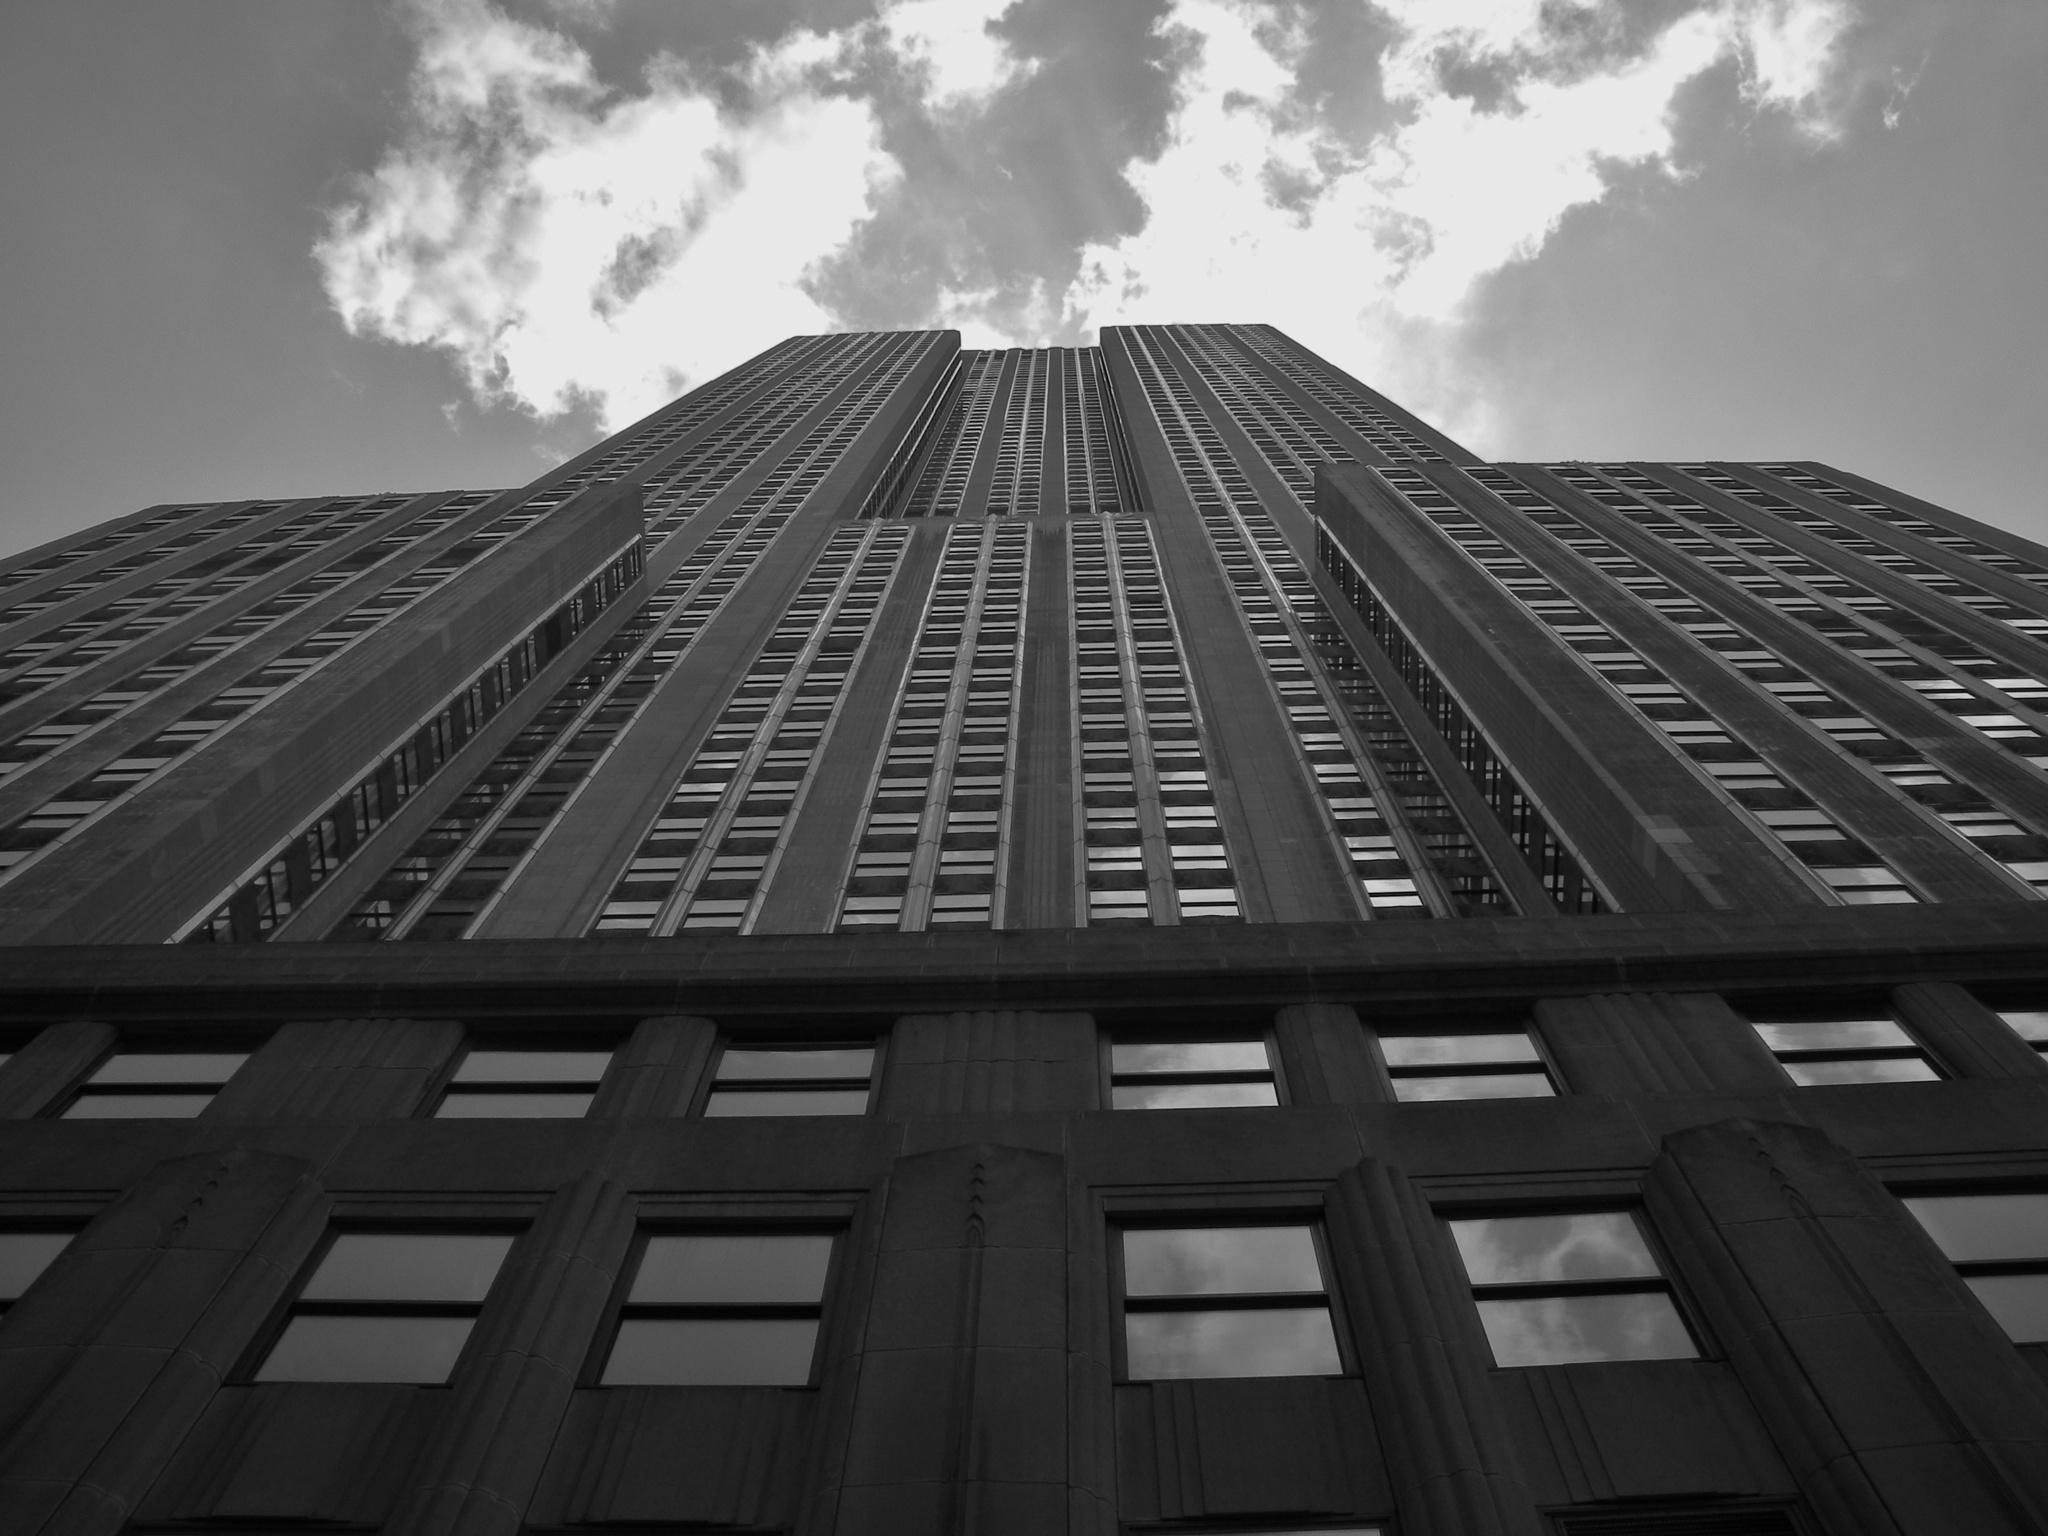 New York by Ola Edestav